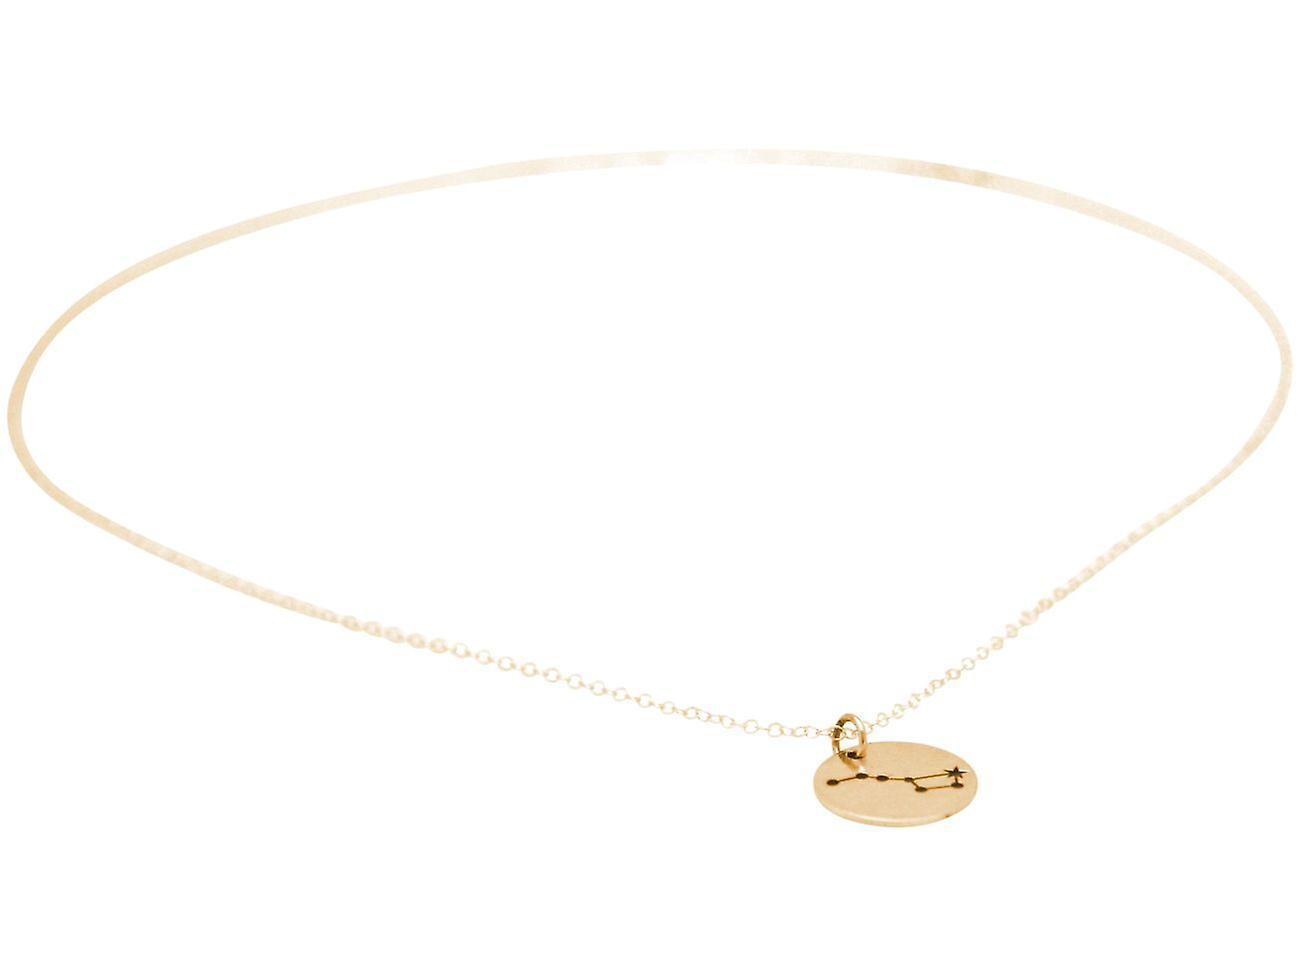 Konstellation Halskette Großer Bär, Großer Wagen aus 925 Silber, vergoldet, rose